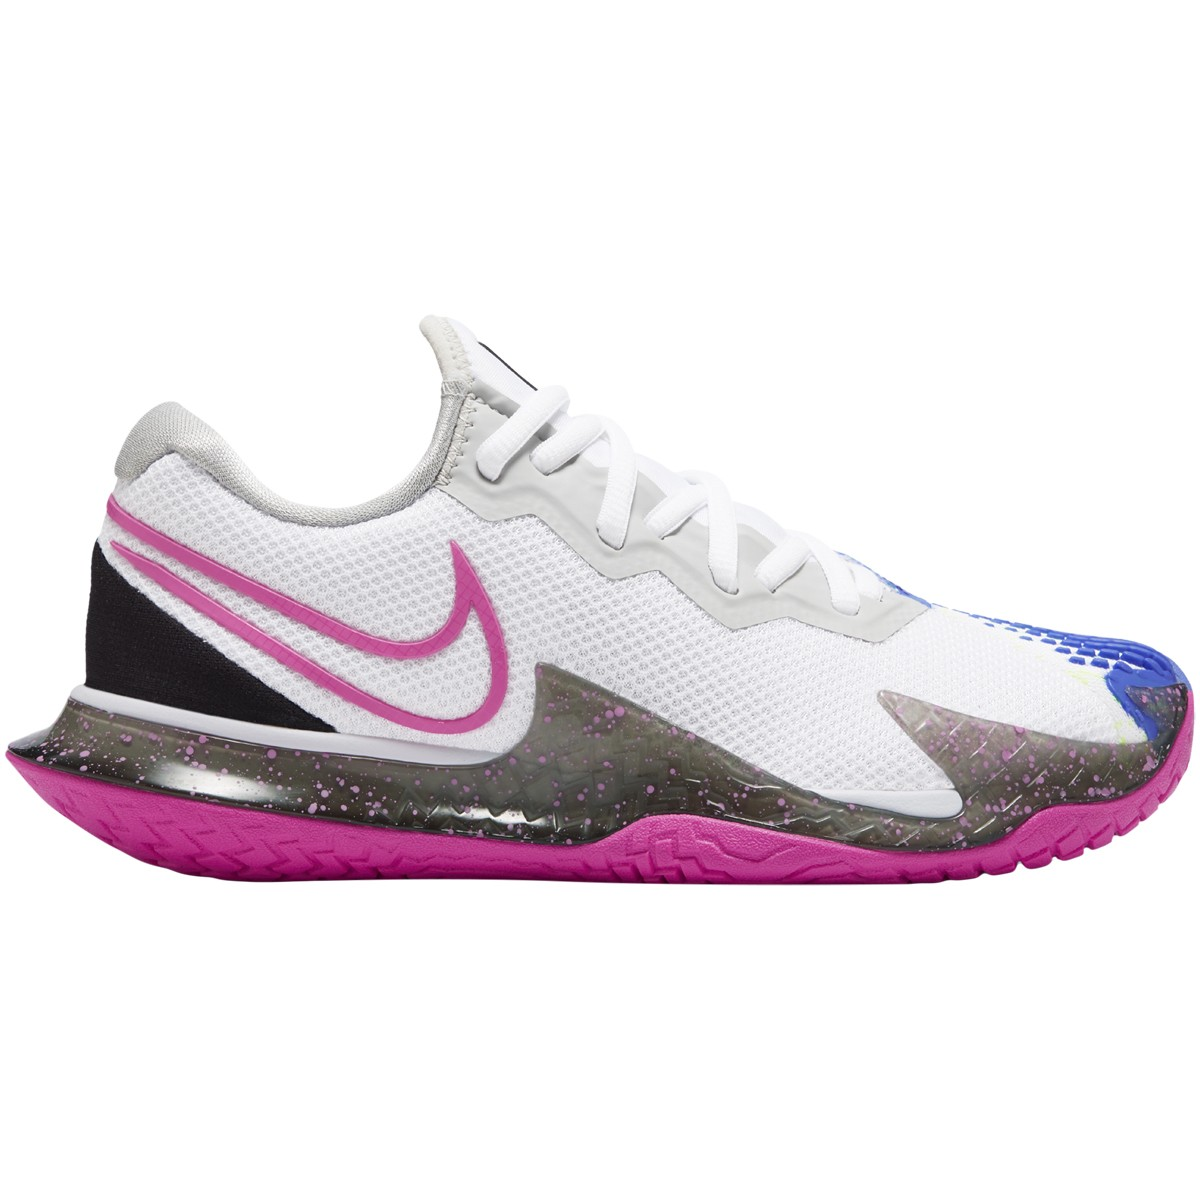 chaussure tennis nike femme